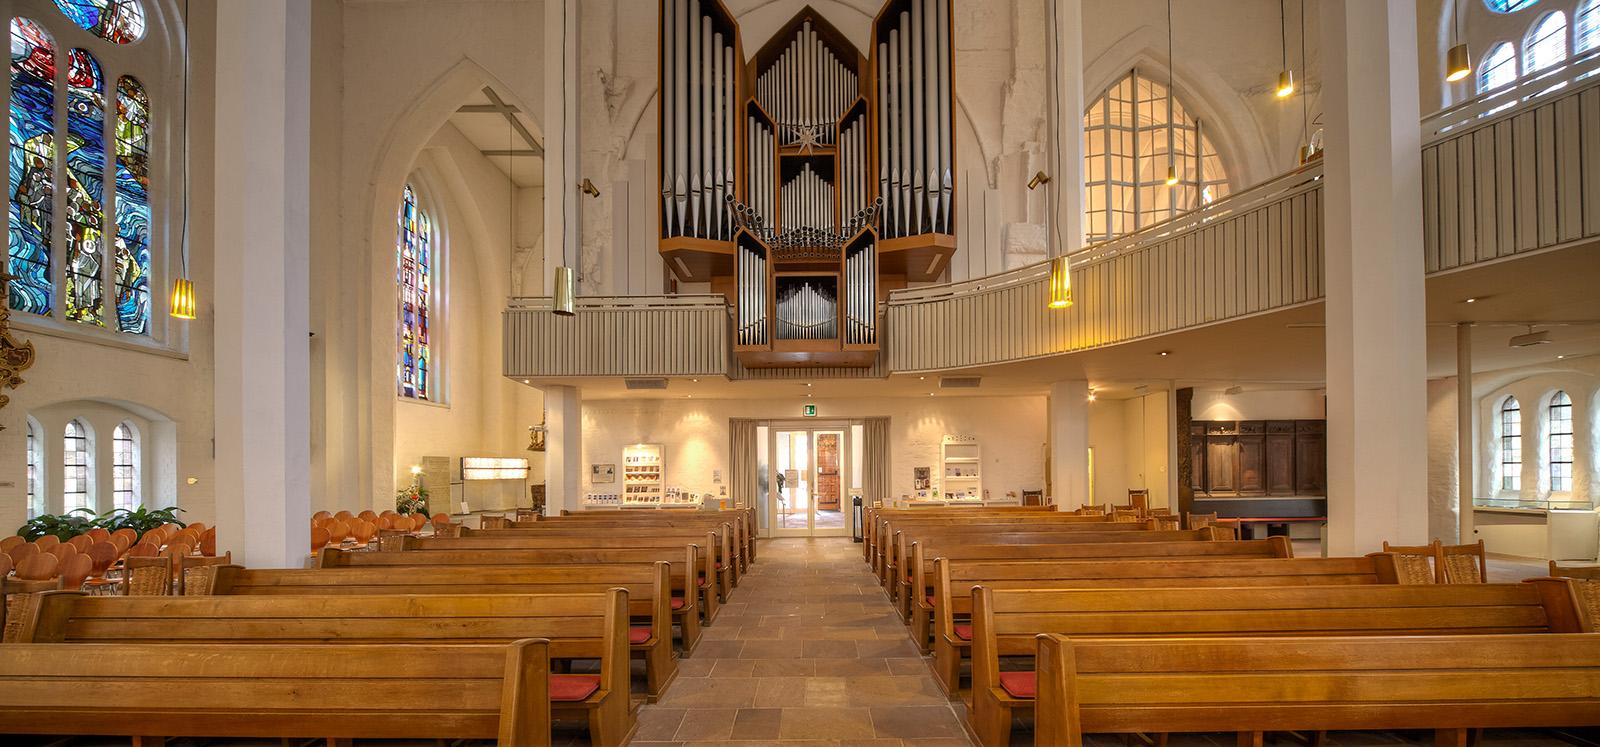 Offene Kirche Sankt Nikolai Zu Kiel